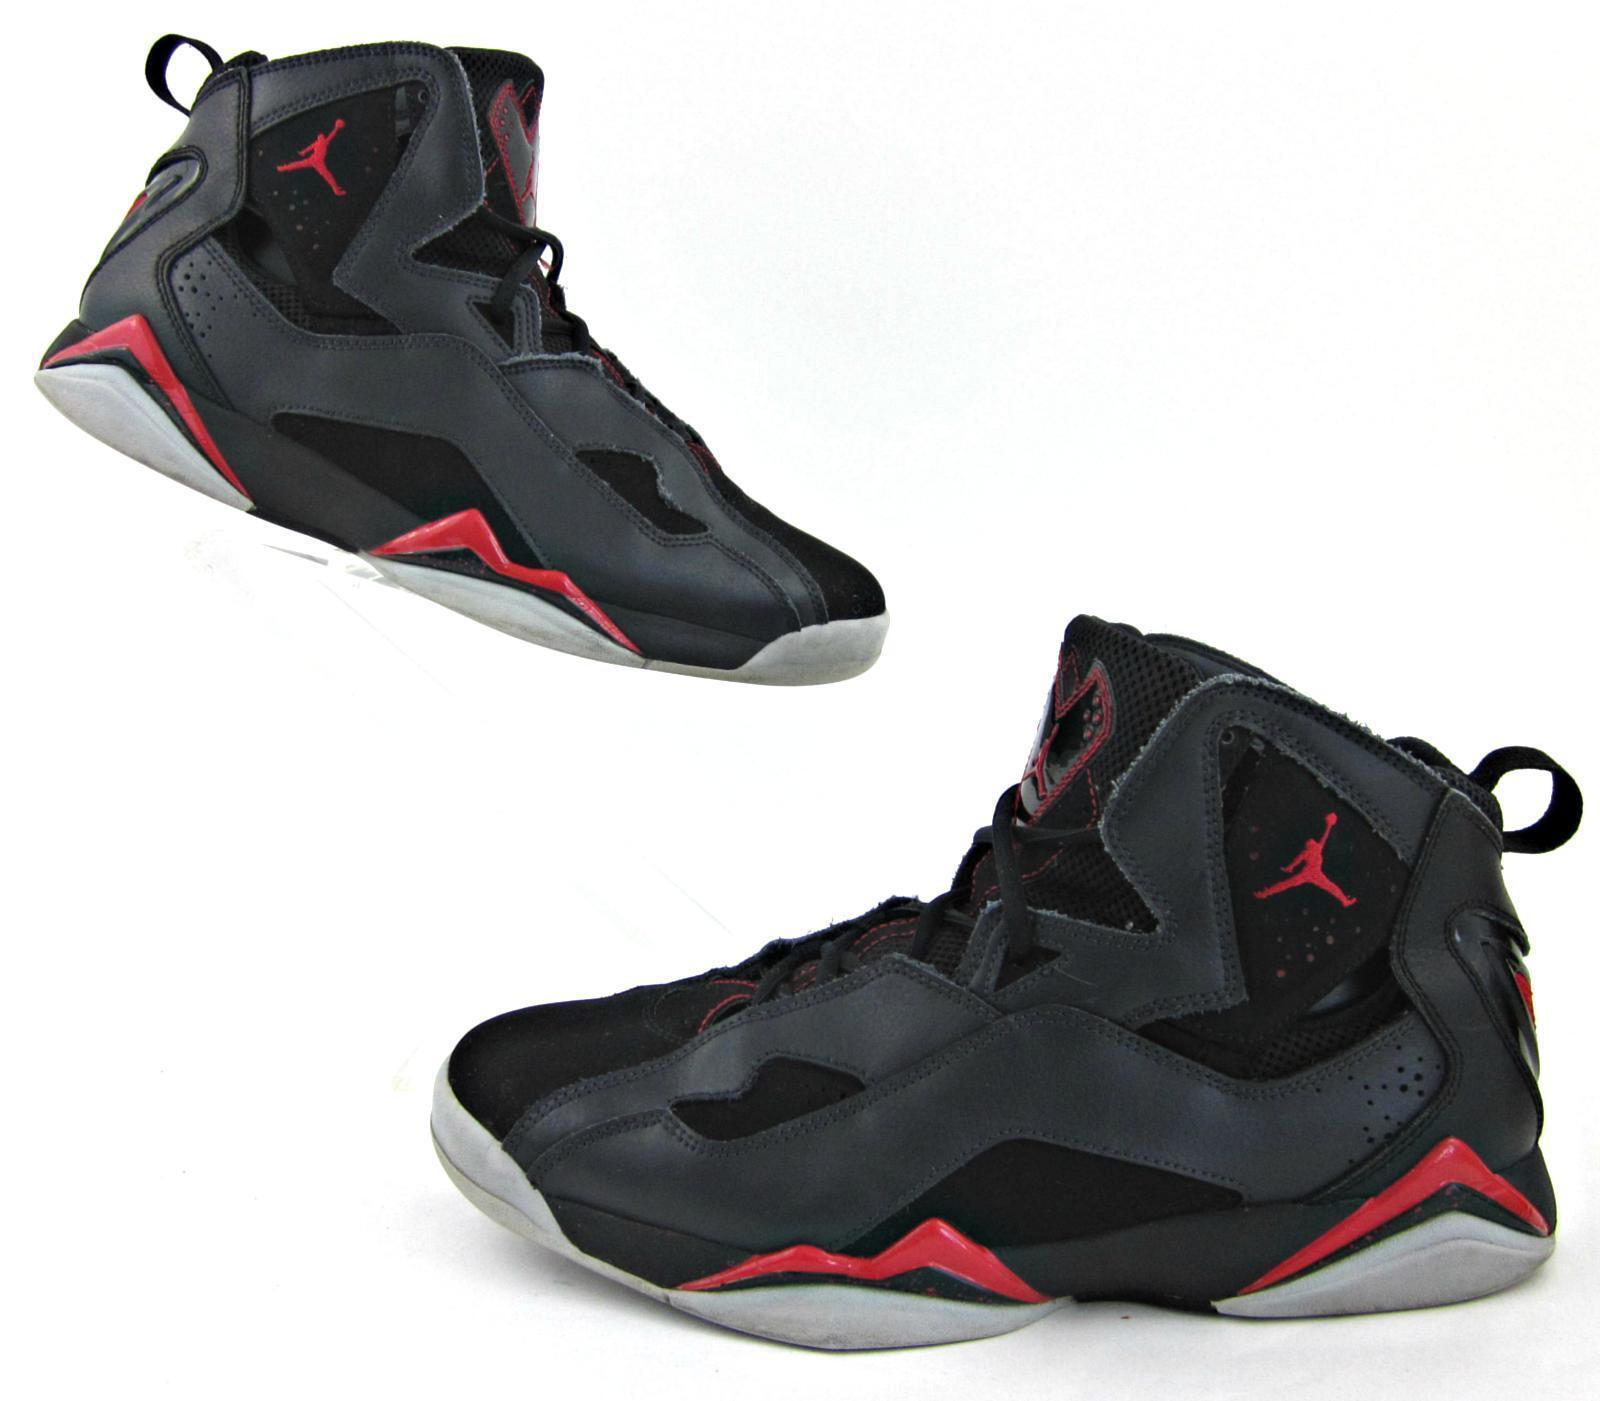 Jordan 2015 True Flight Black Gym Red Anthracite Wolf Grey Sz 11 342964-002 Cheap women's shoes women's shoes